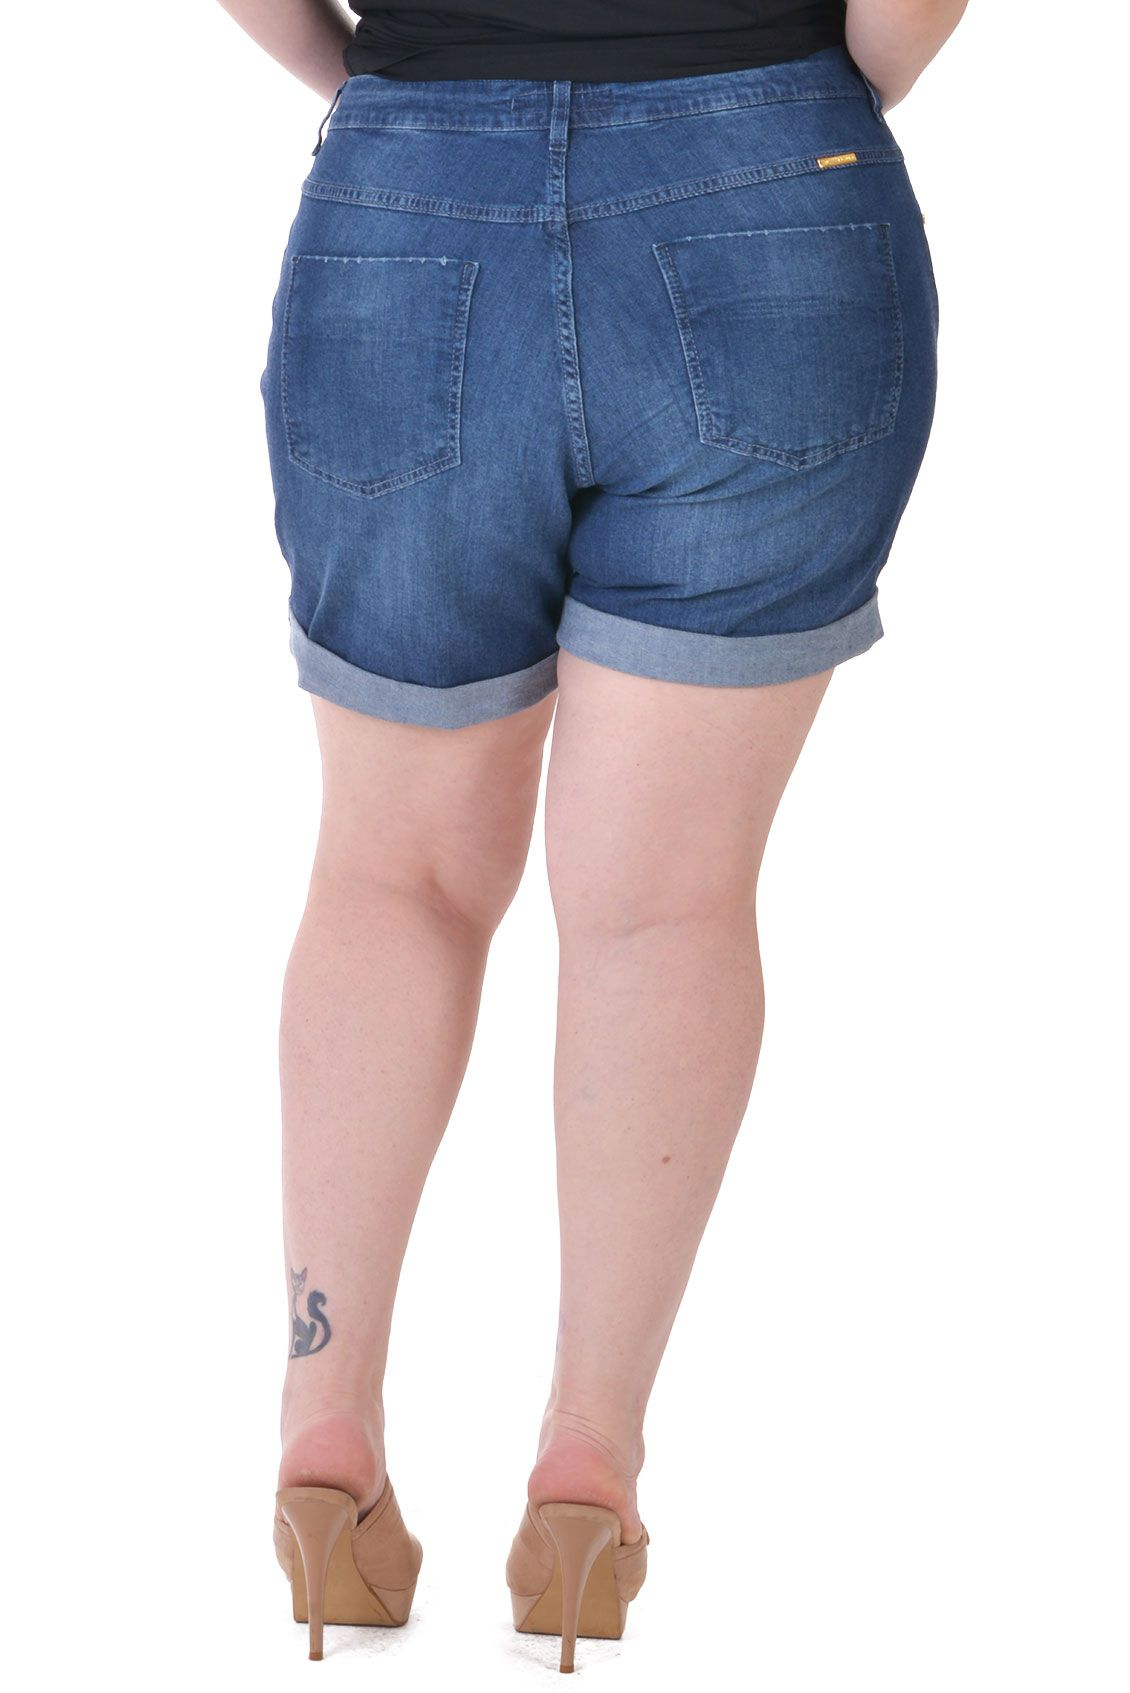 Shorts Jeans Plus Size Torn